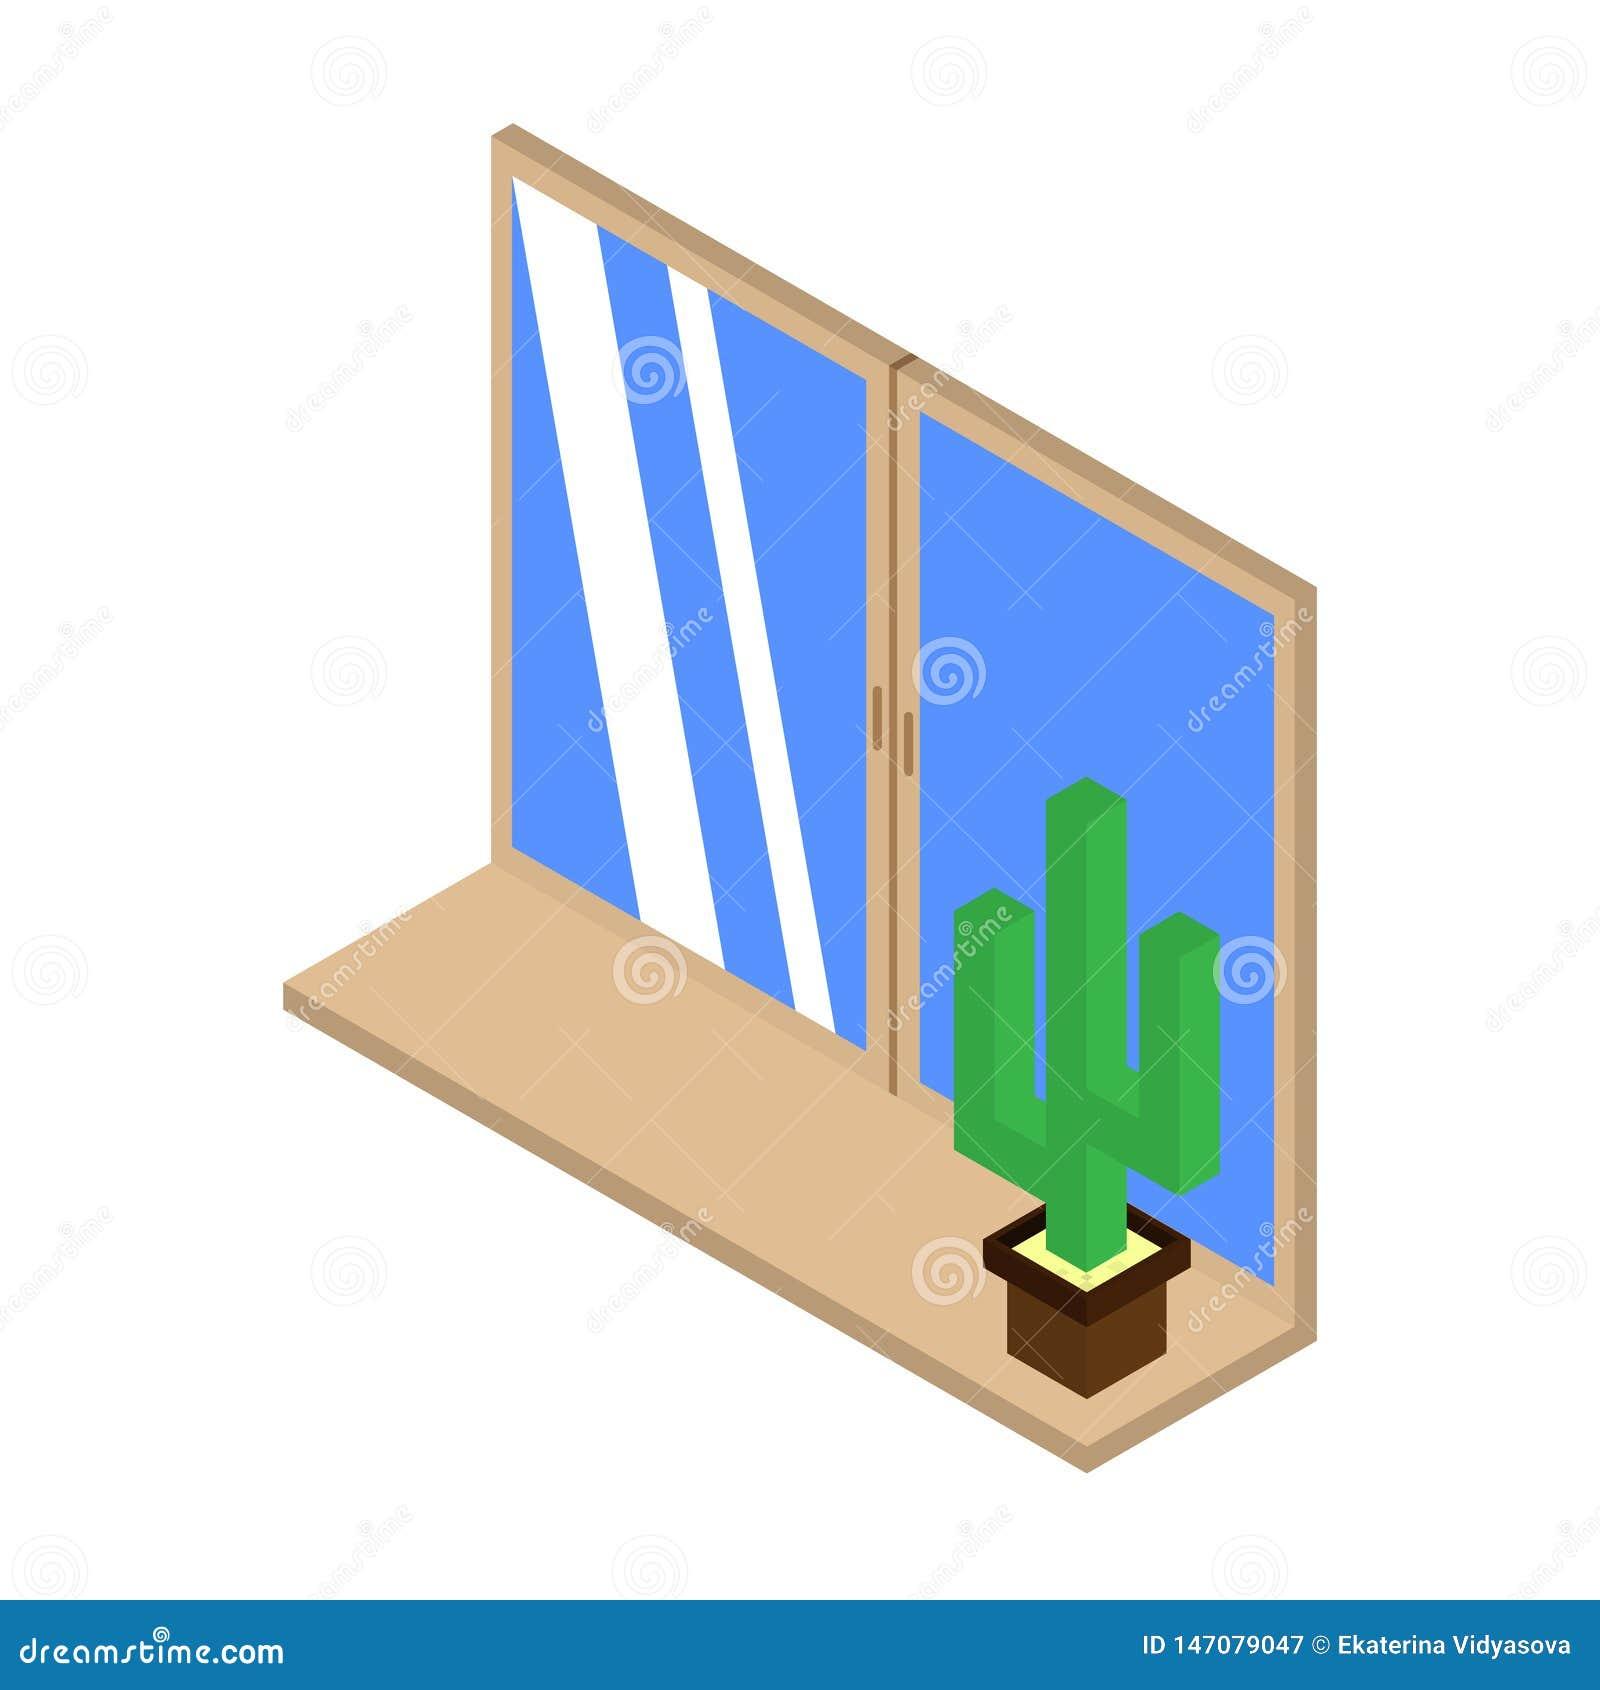 Cactus Icon On The Windowsill  Isometric Illustration Of A